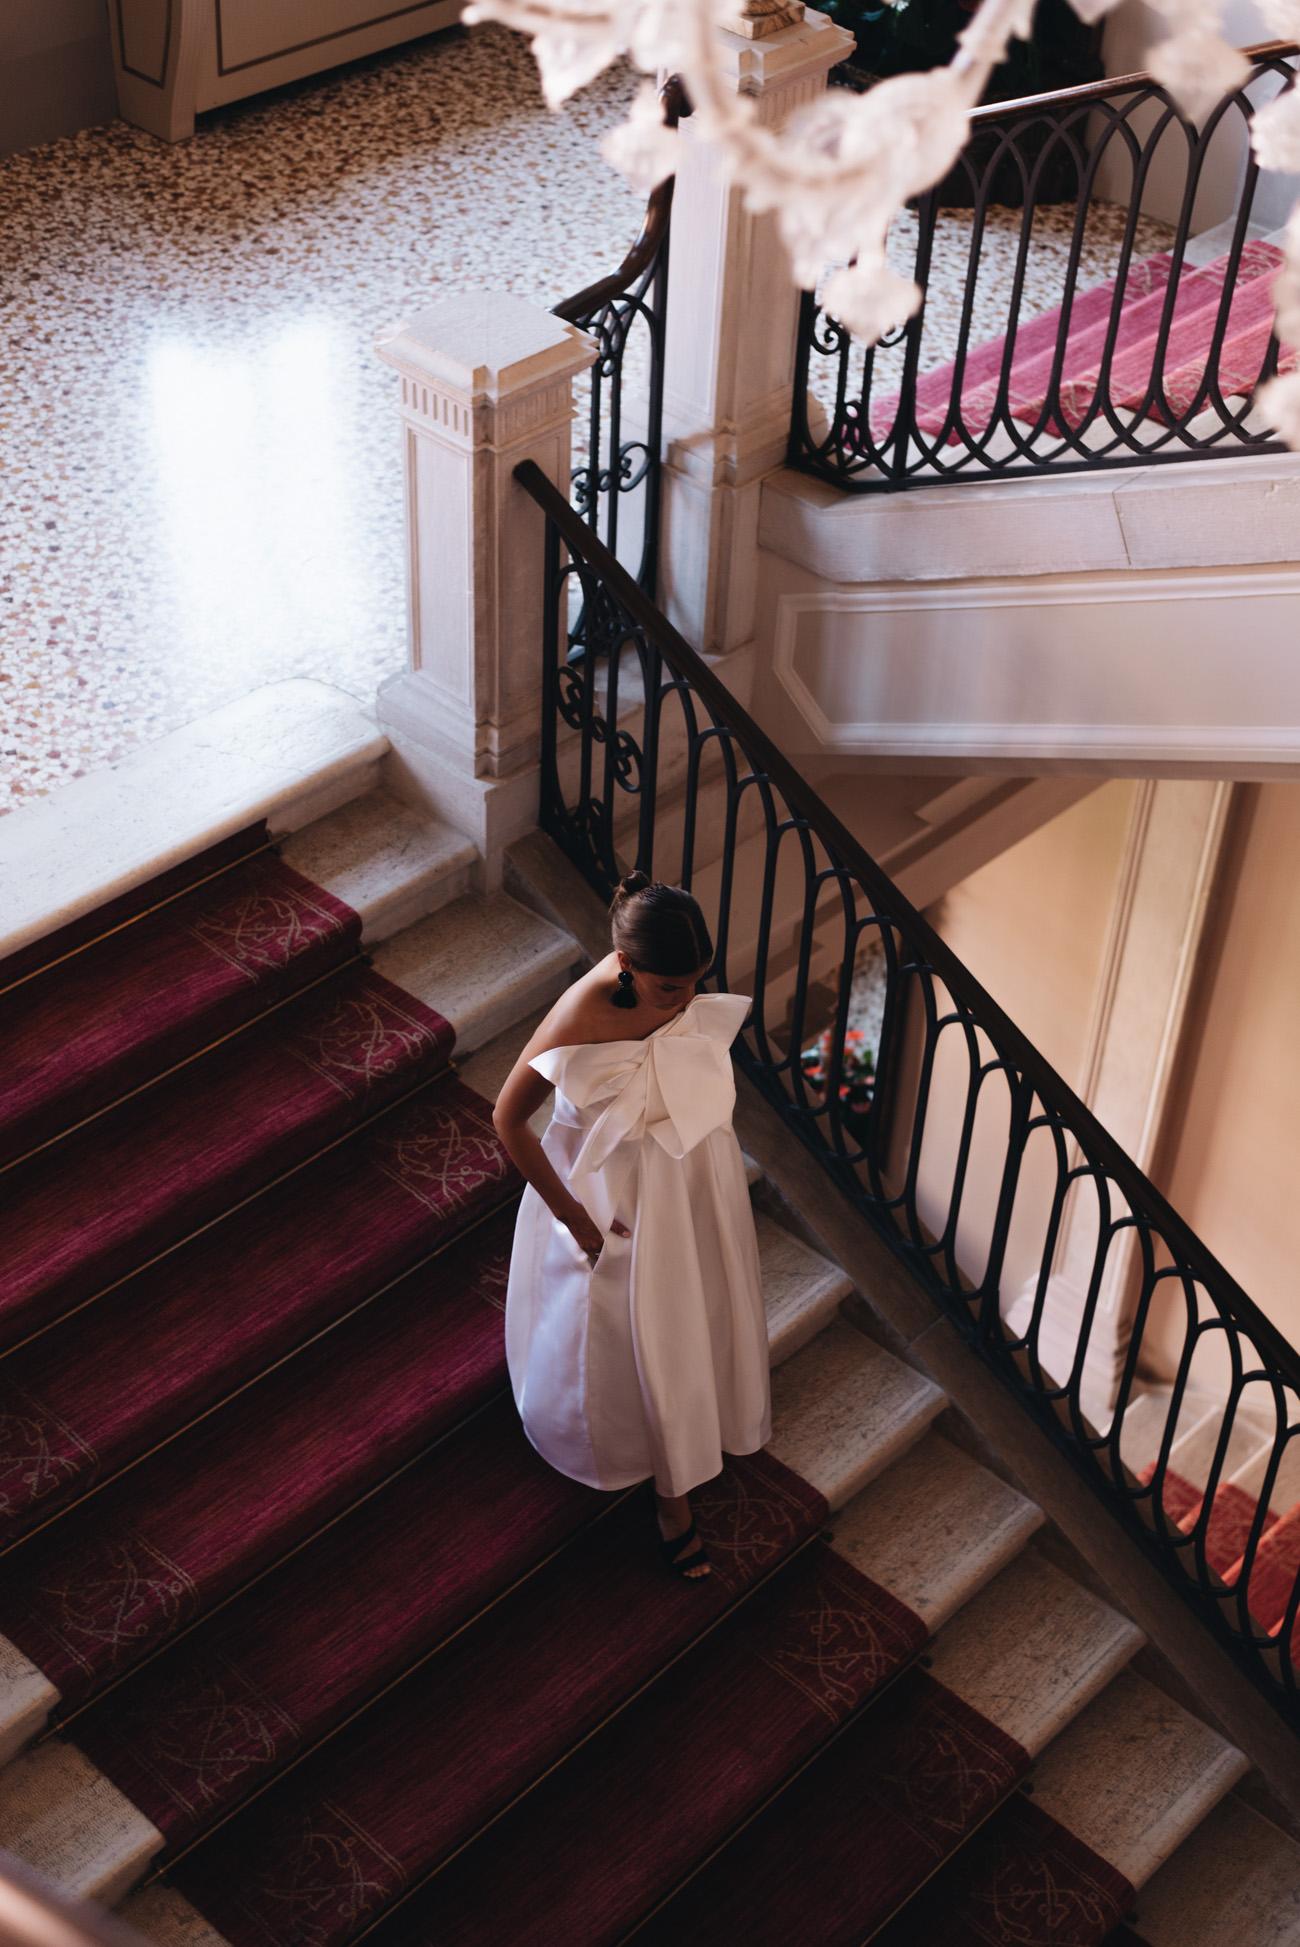 Talbot-Runhof-Midikleid-Norwell1-nina-schwichtenberg-fashion-editorial-shooting-hotel-kempinski-venice-fashiioncarpet